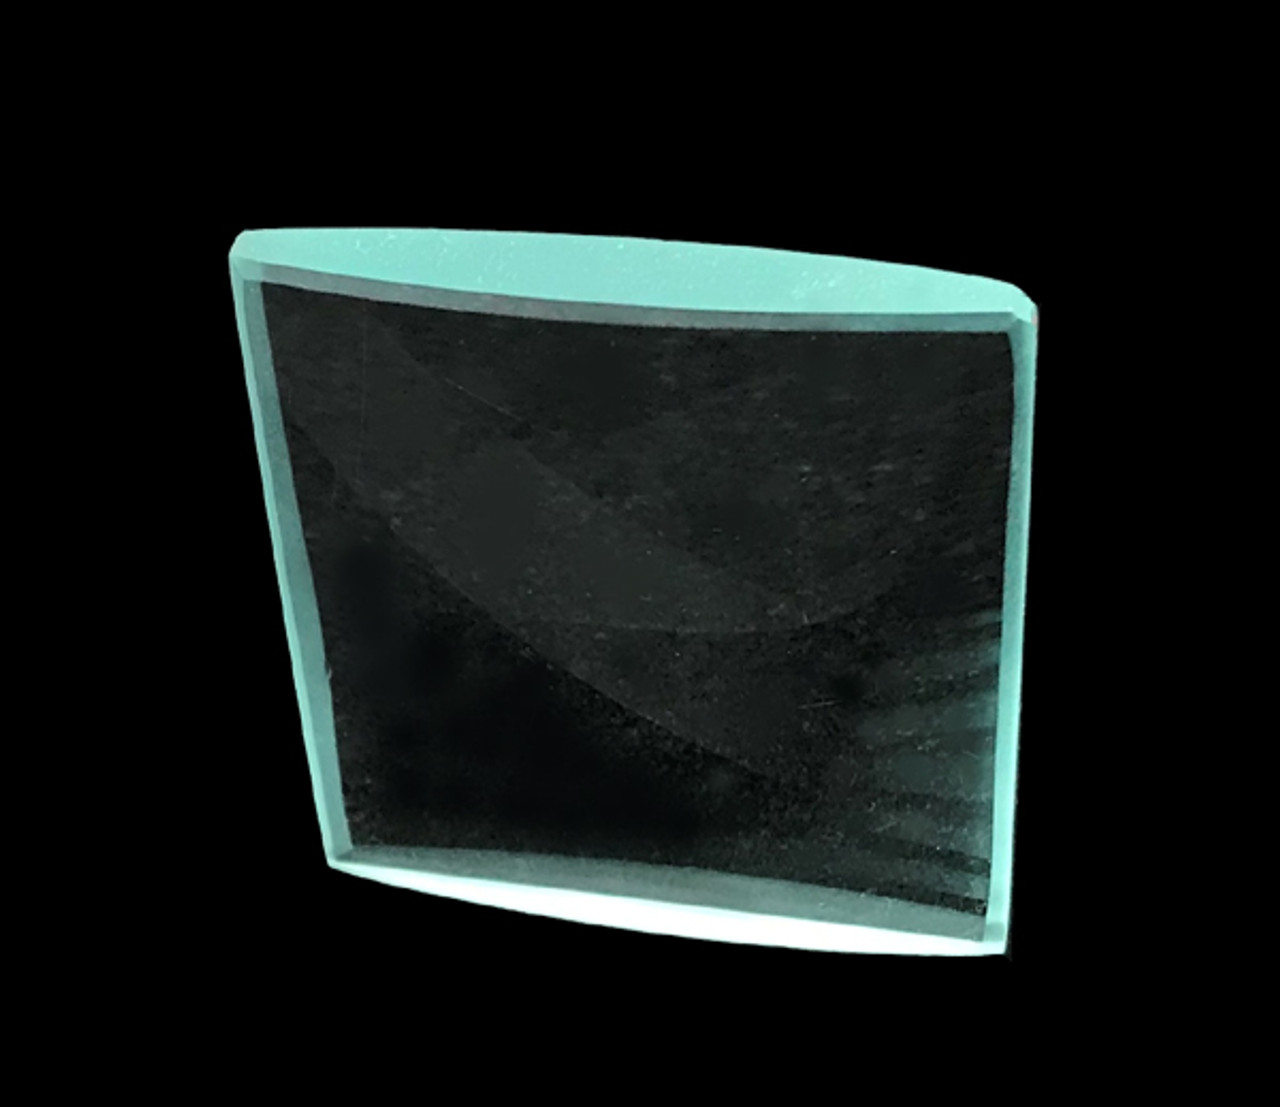 Glass Cylindrical Lens, Bi-Convex 50 x 45 mm, Power: 7D